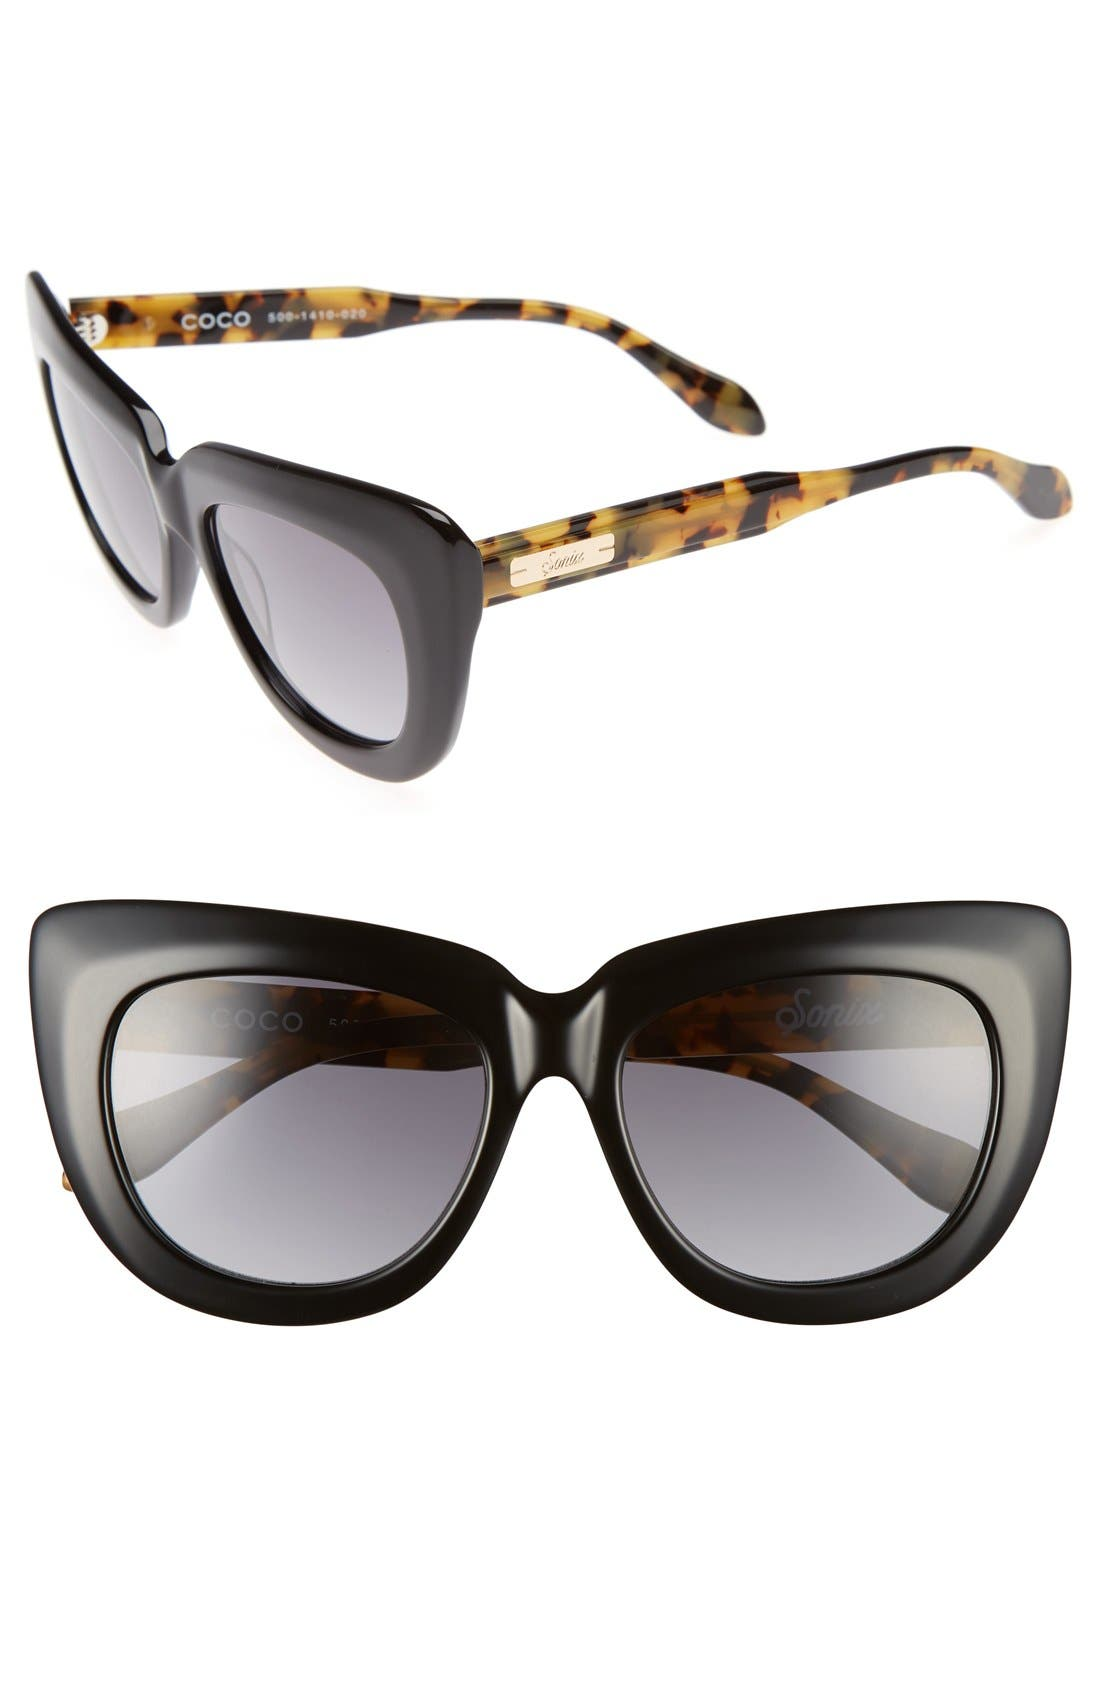 Sonix Coco 55mm Gradient Cat Eye Sunglasses